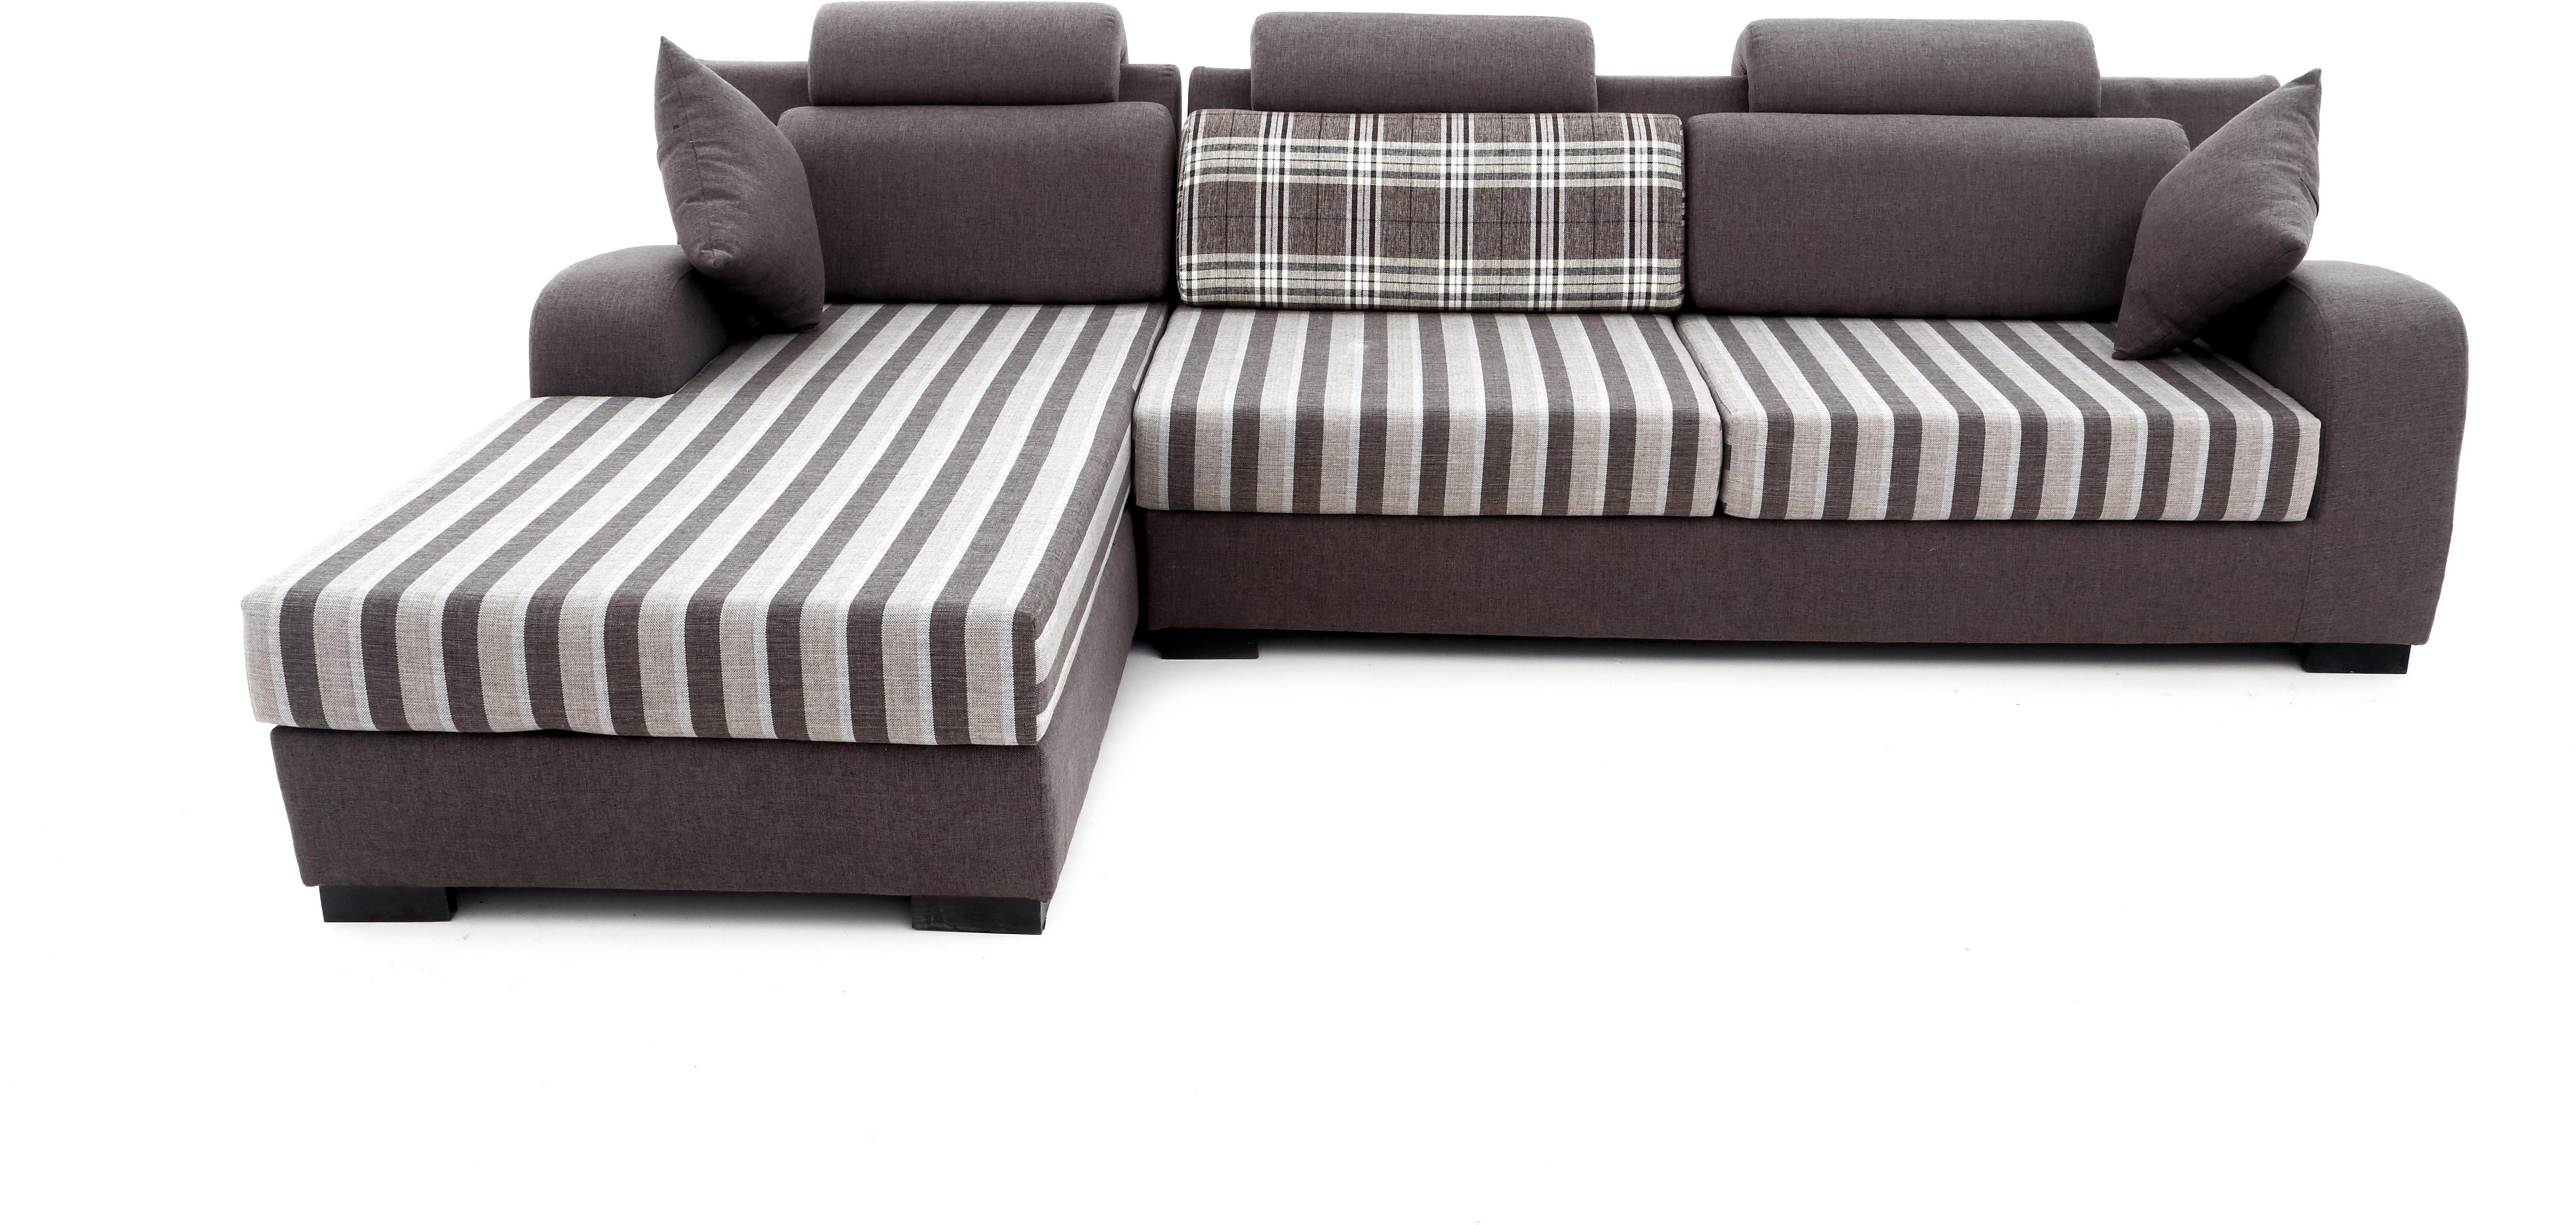 Furnicity Fabric 3 1 Grey Sofa Set Configuration L Shaped